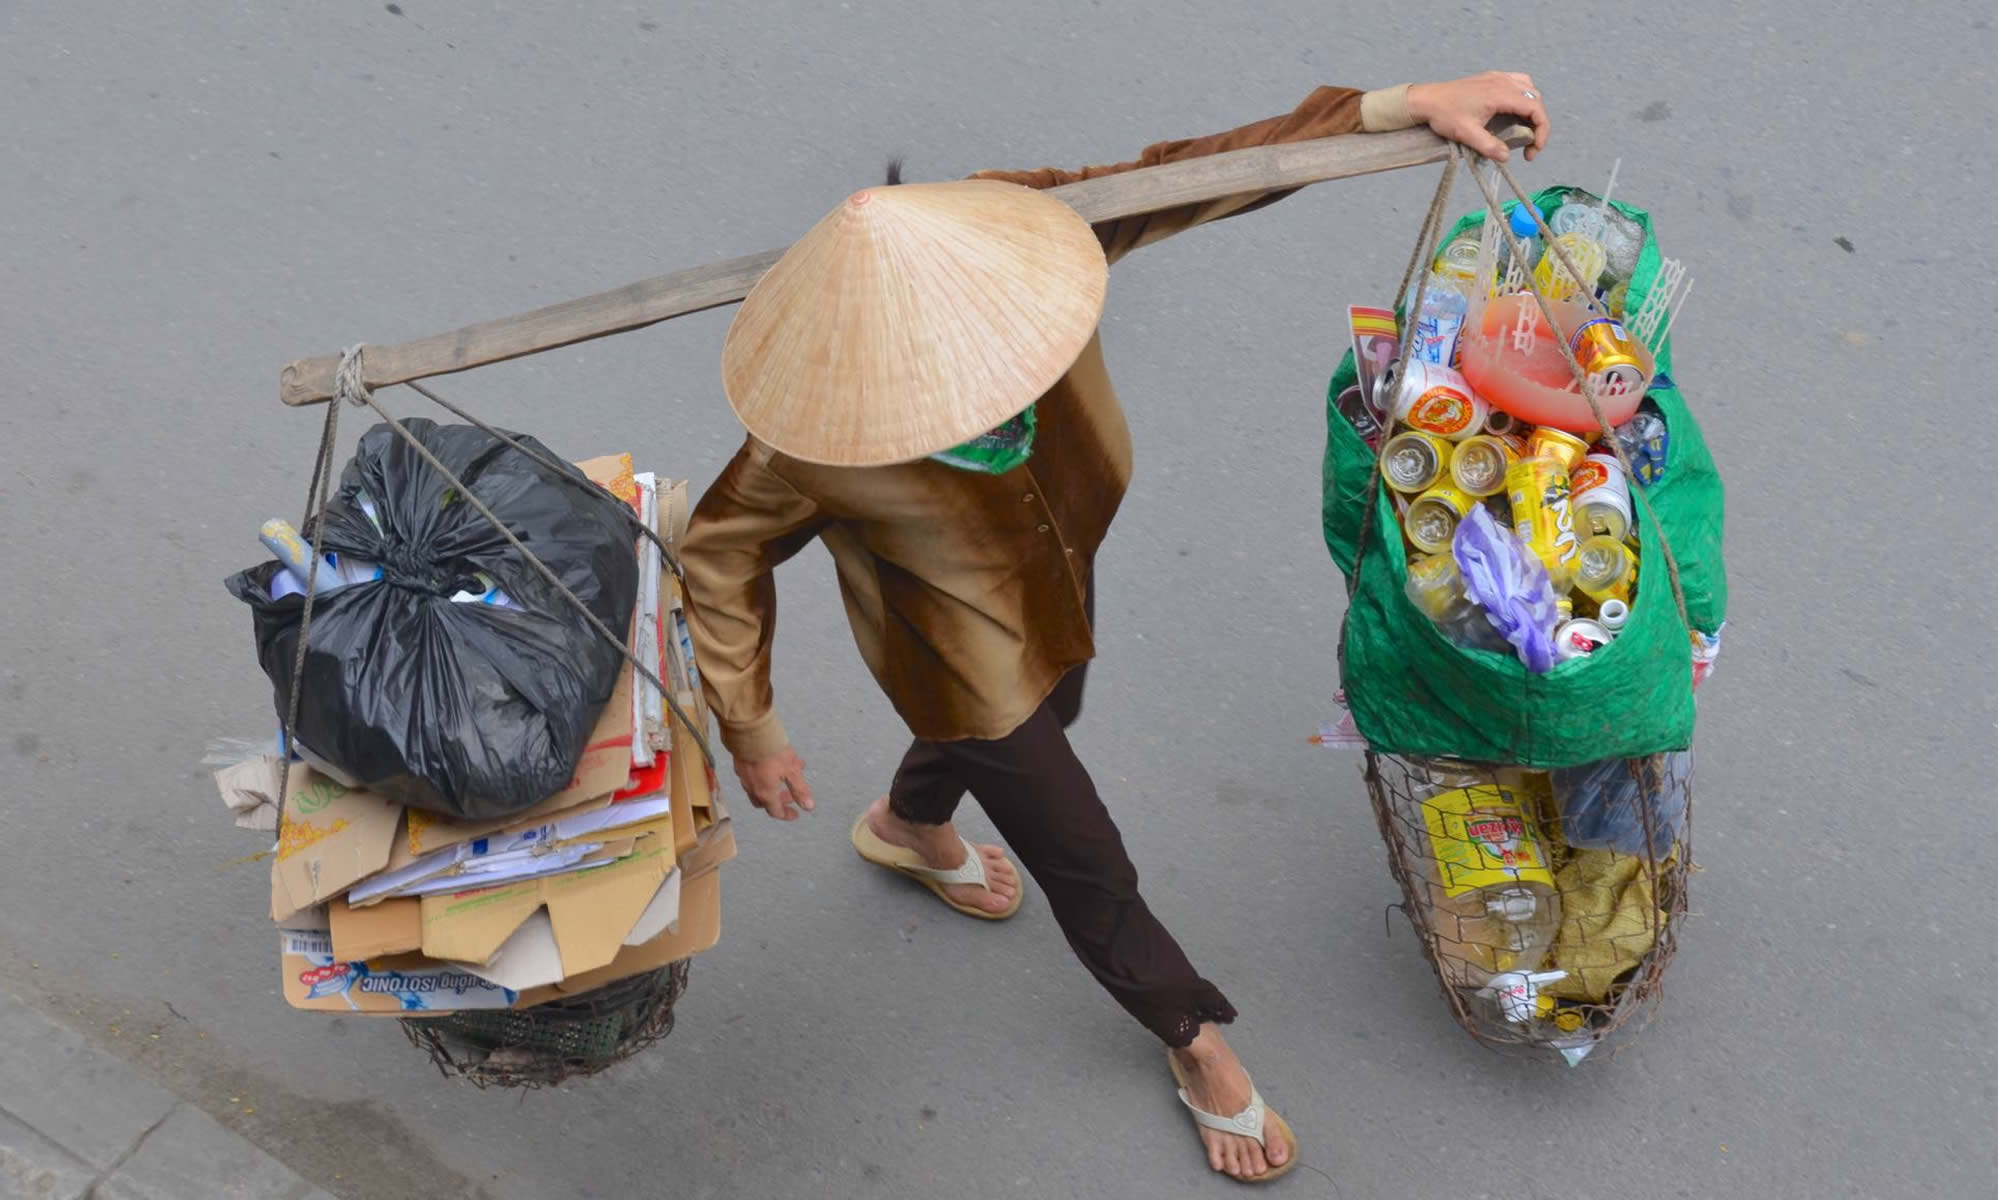 Scenes from Hoi An, Vietnam